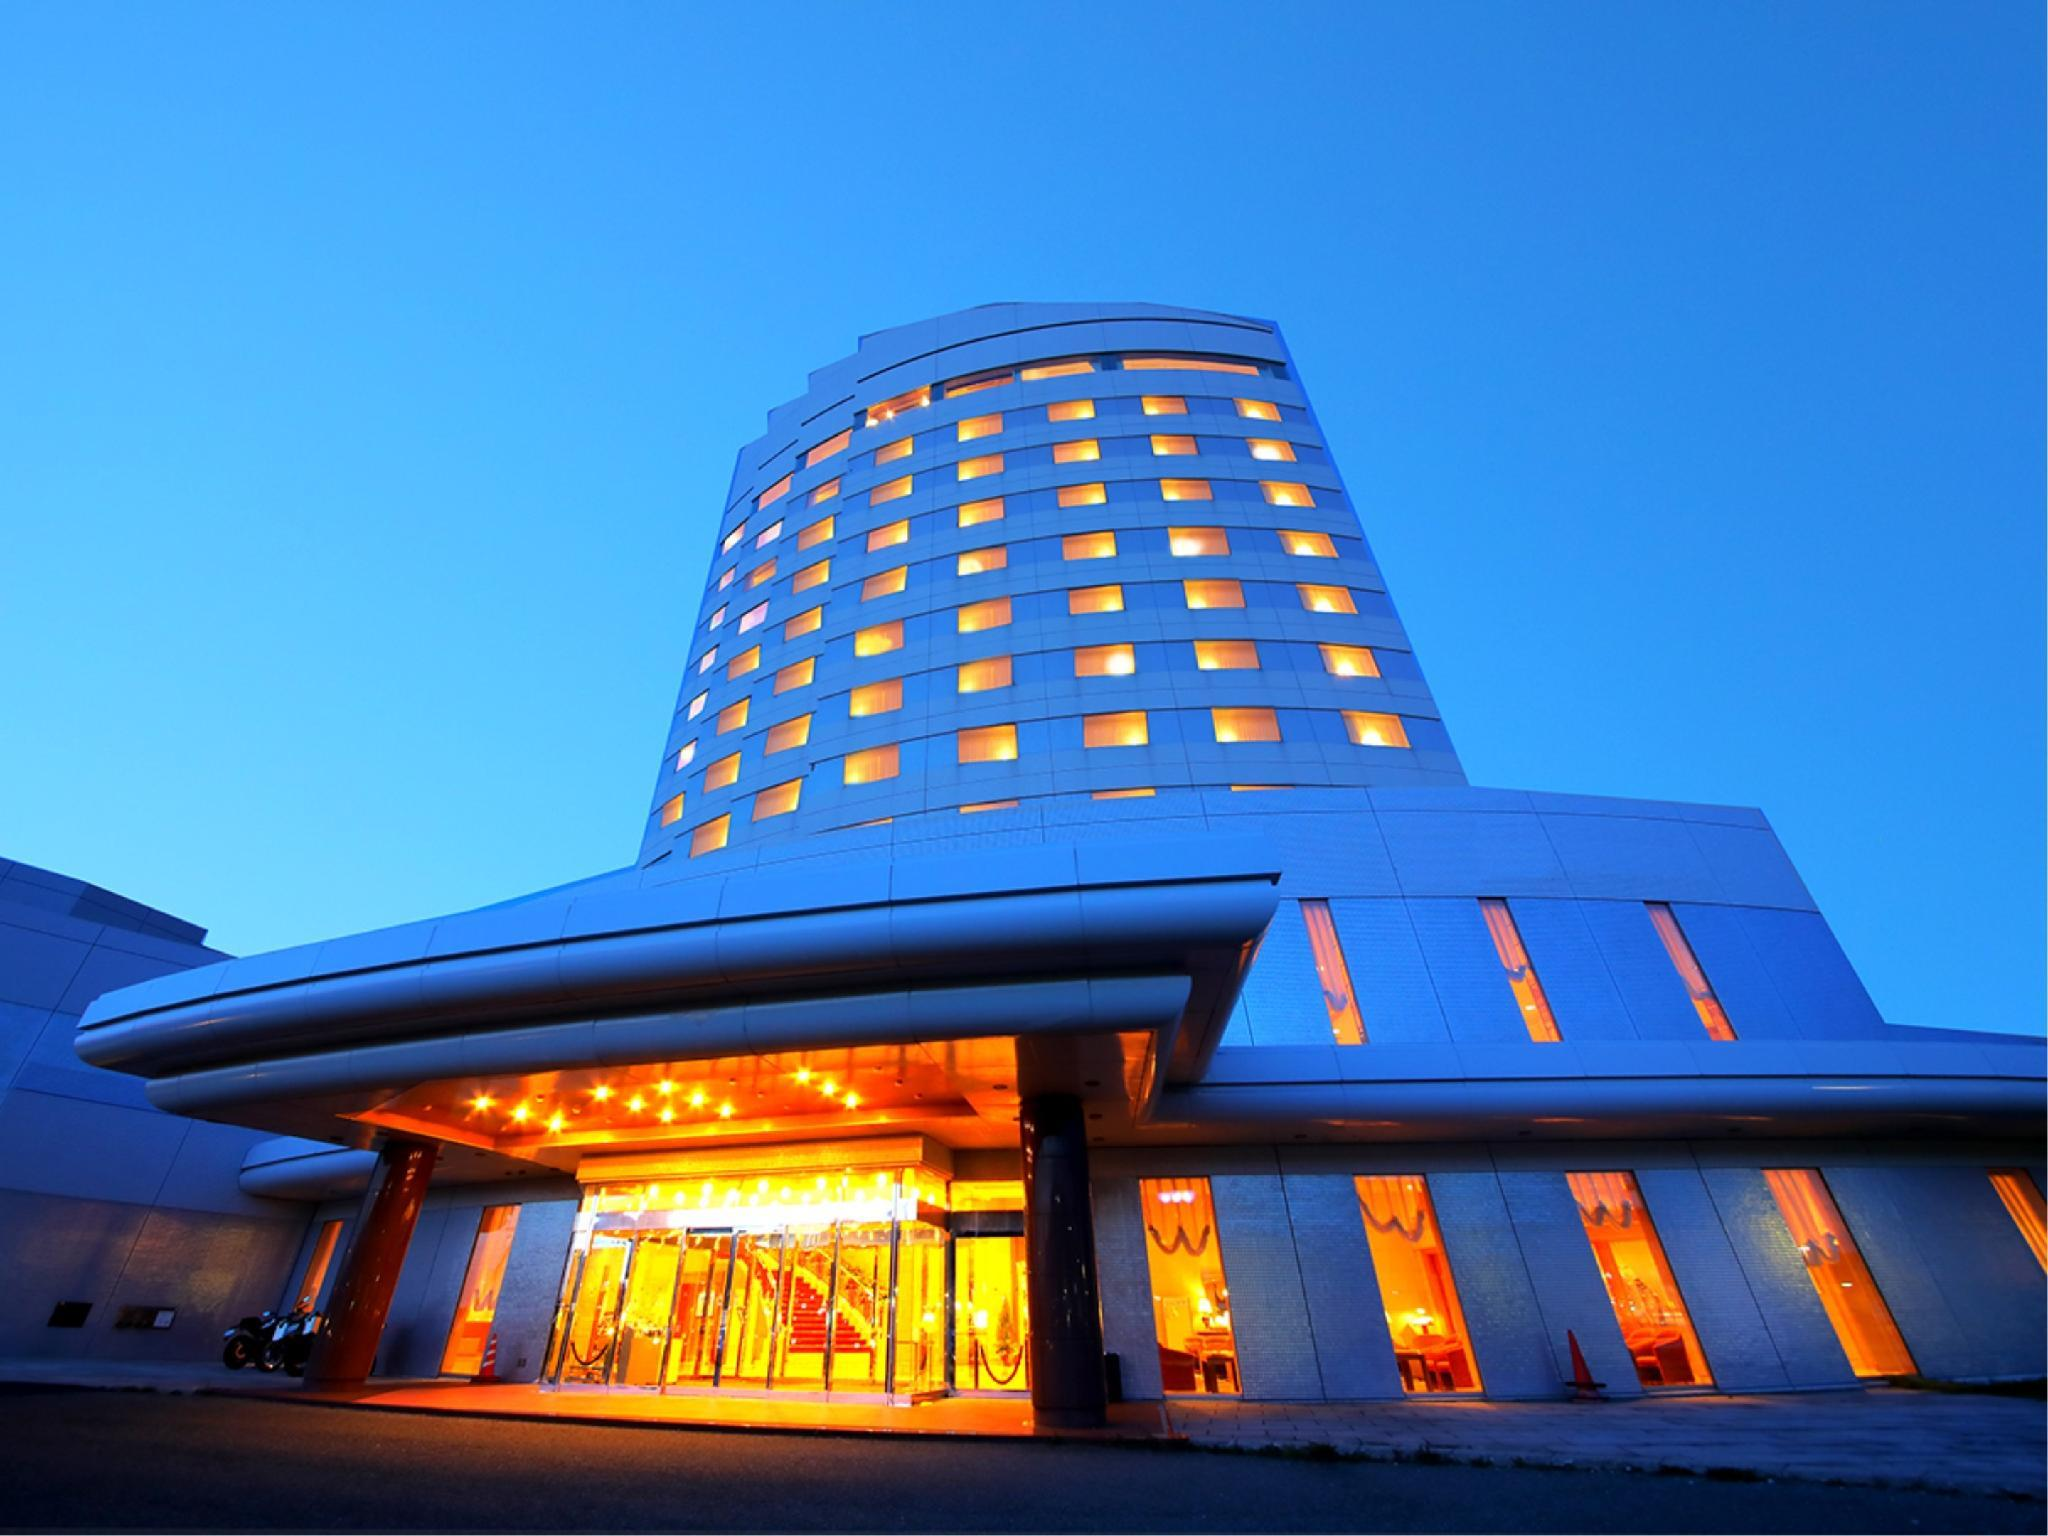 ANA Crowne Plaza Hotel Wakkanai